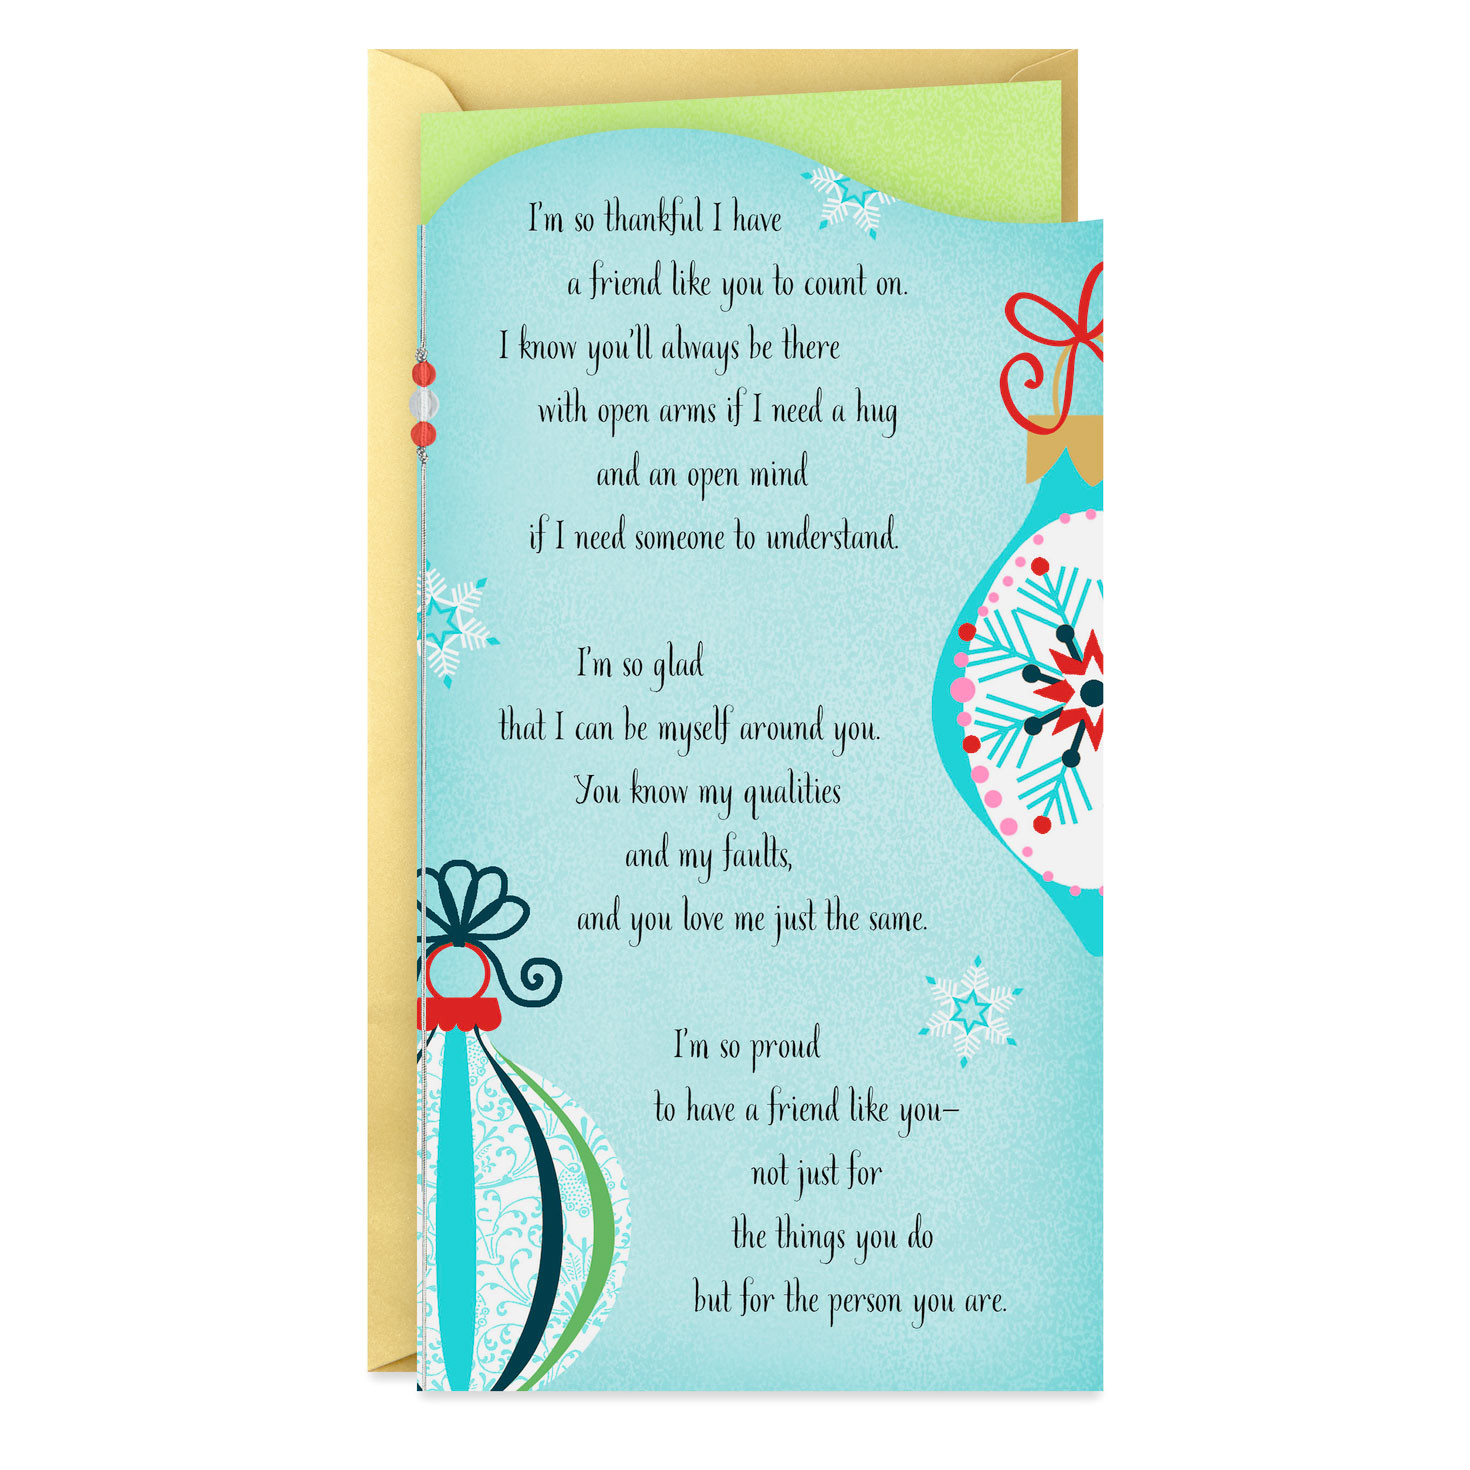 between you and me christmas card friend 499xg1302 01 jpg